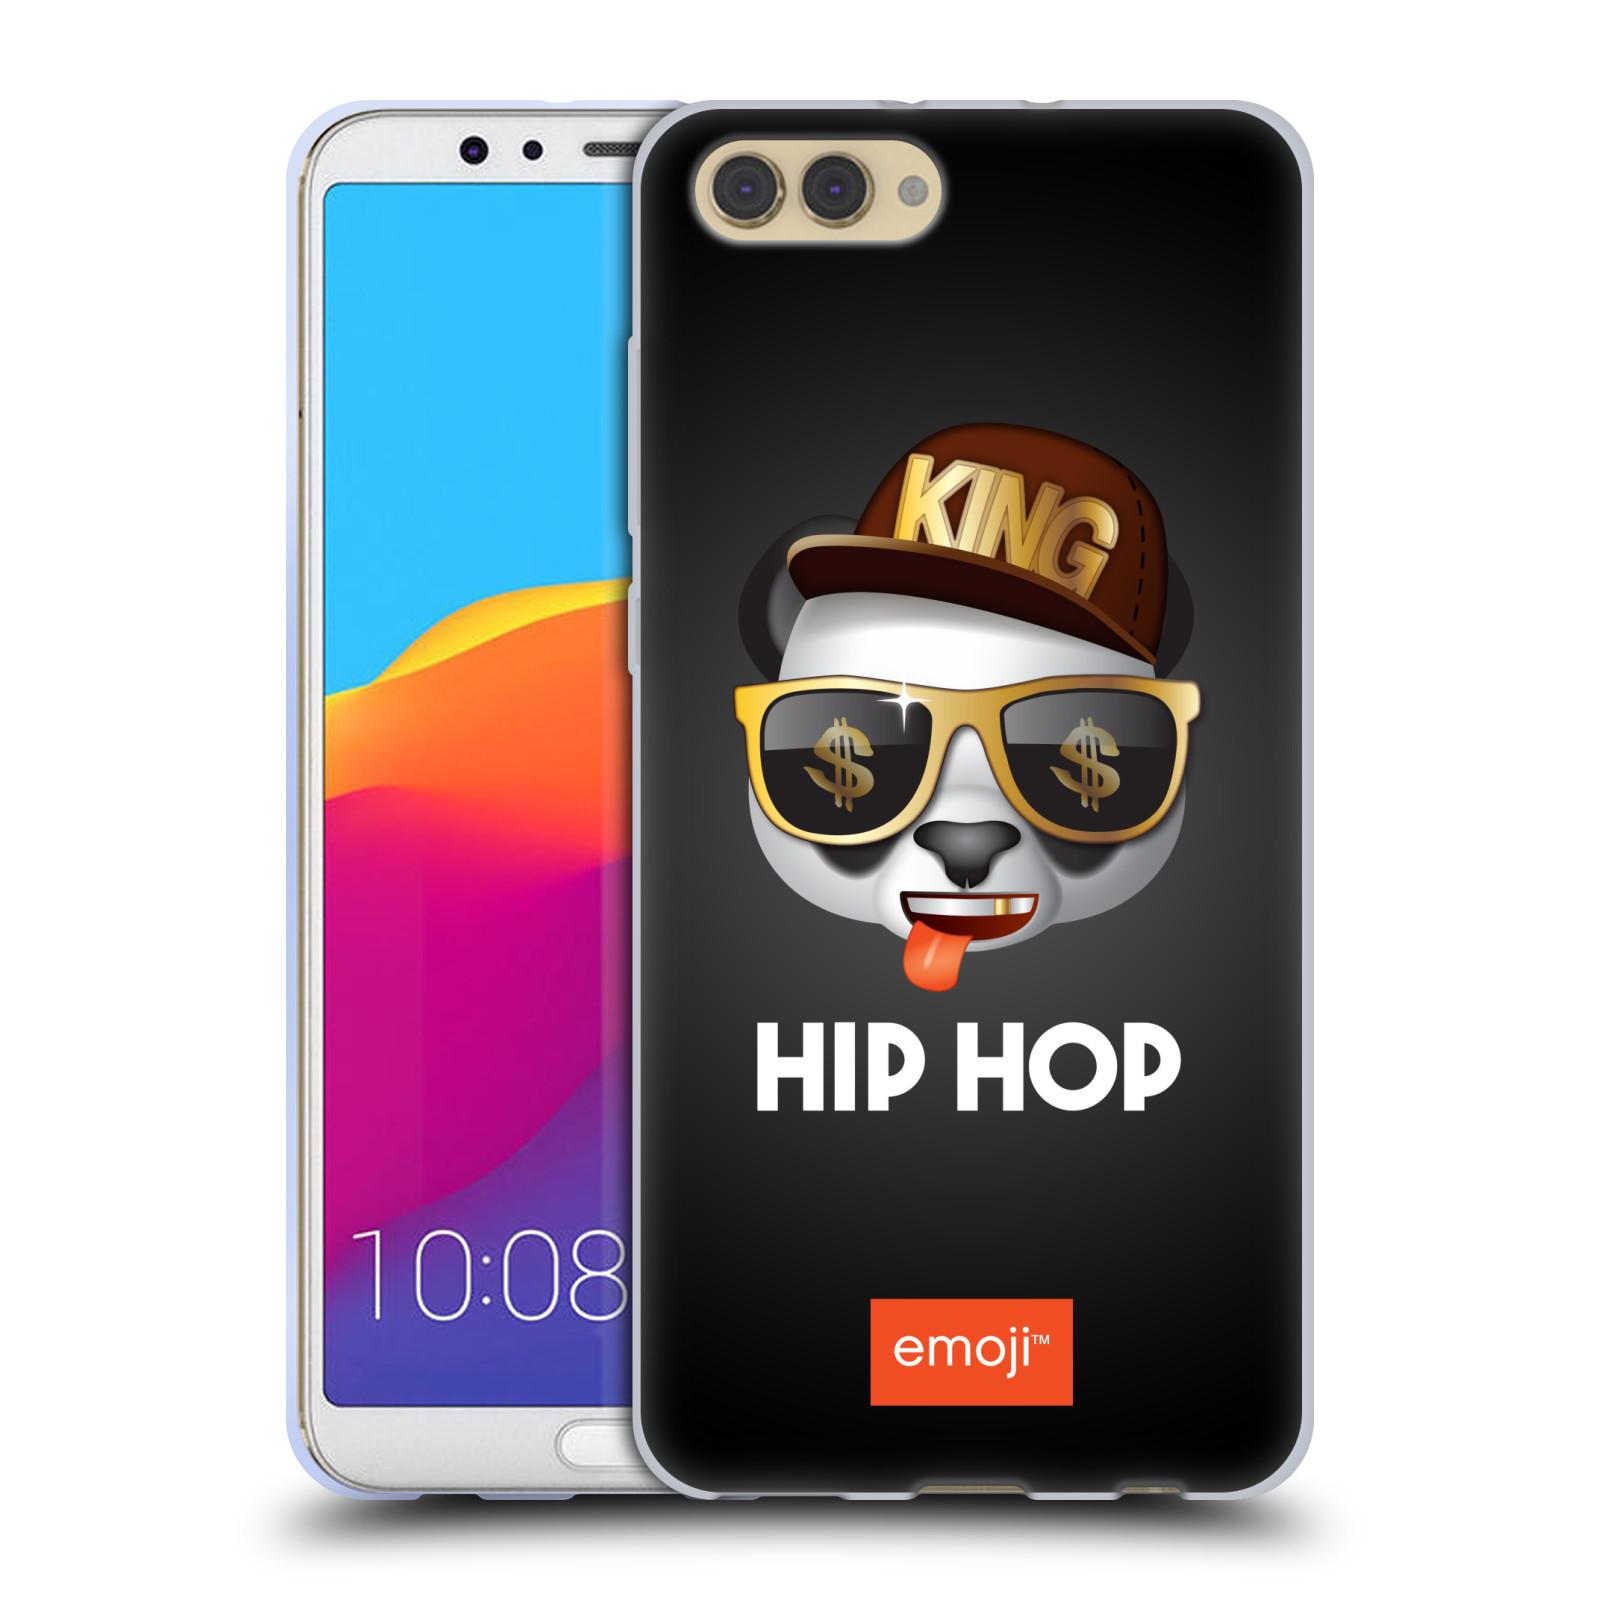 HEAD CASE silikonový obal na mobil Huawei HONOR VIEW 10 / V10 oficiální kryt EMOJI hudba hudební styl HIP HOP